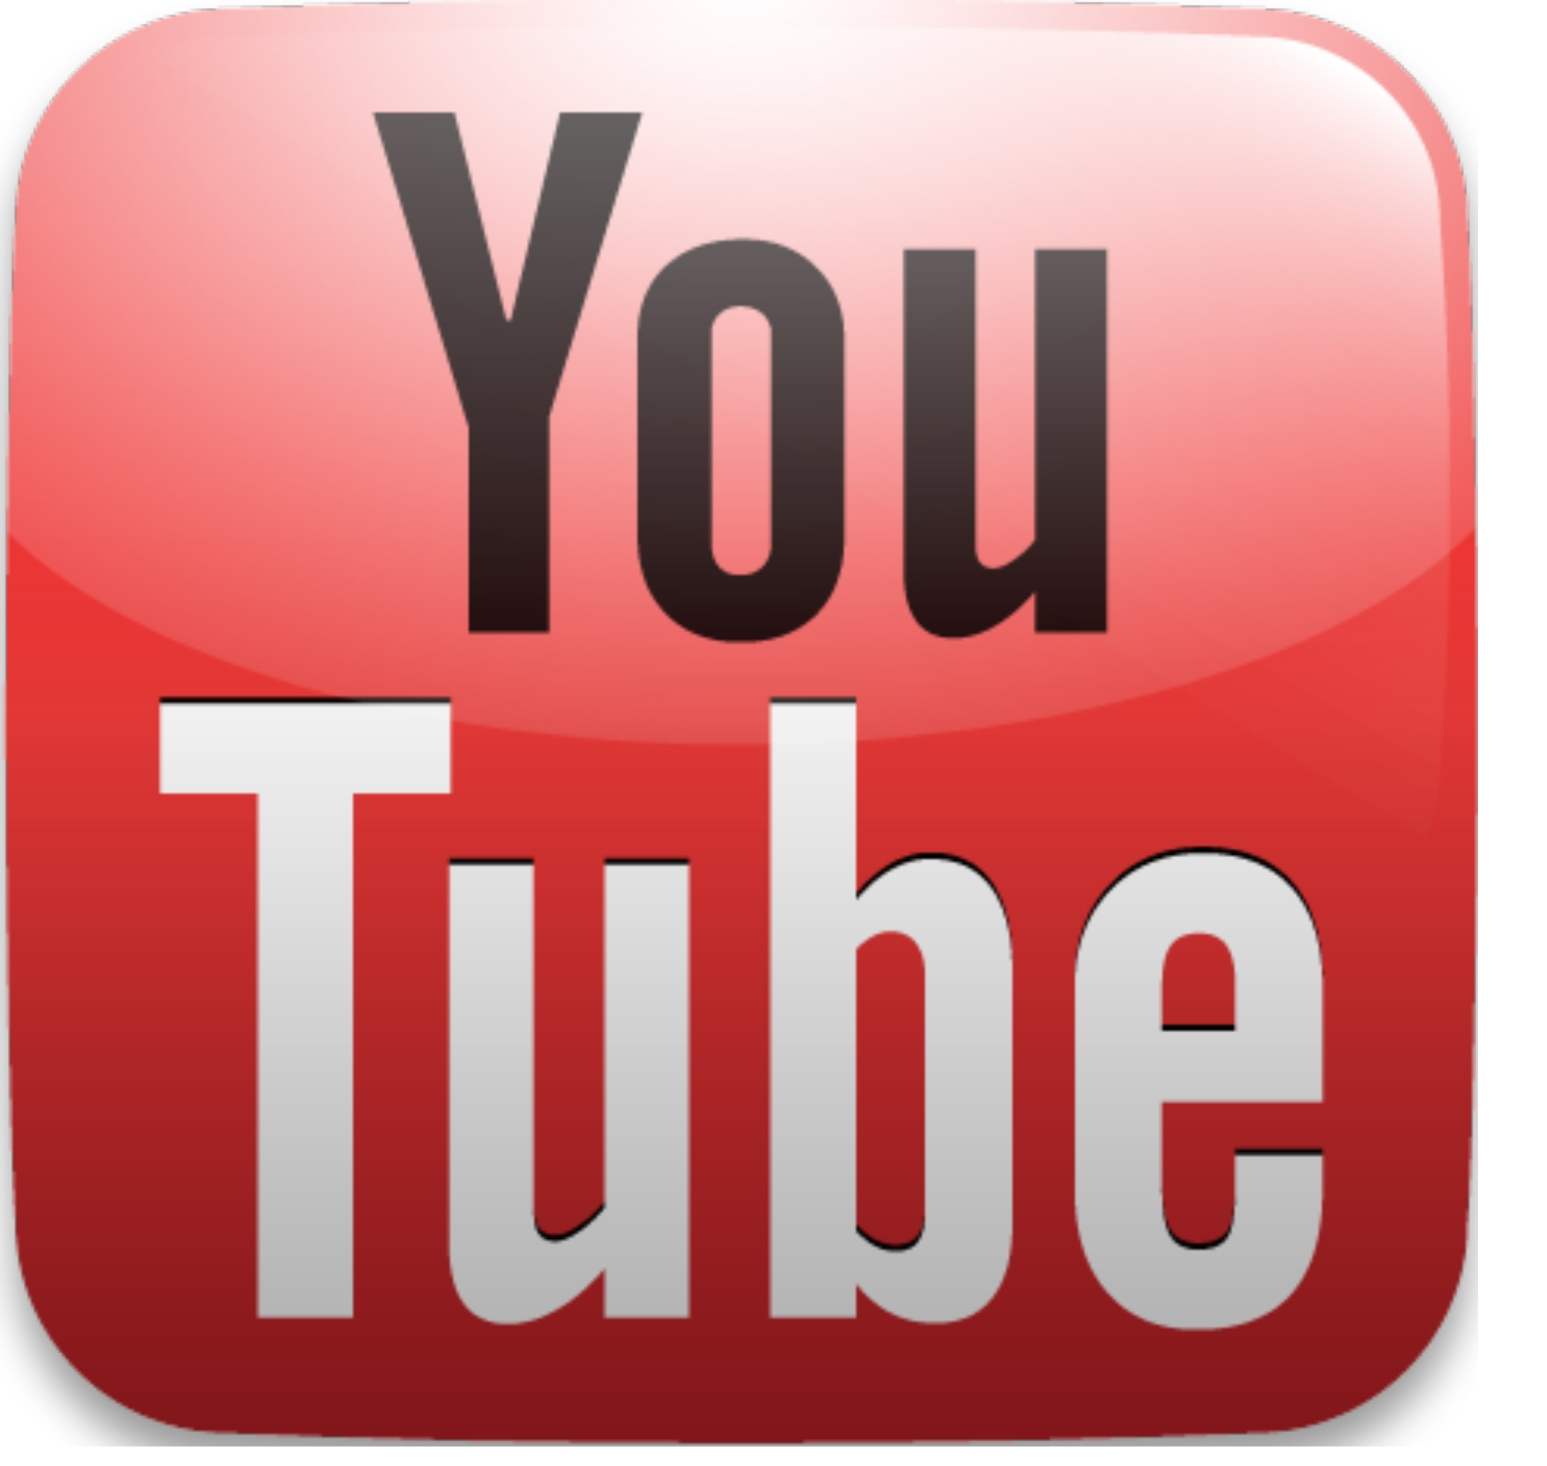 youtube logo button newhairstylesformen2014com